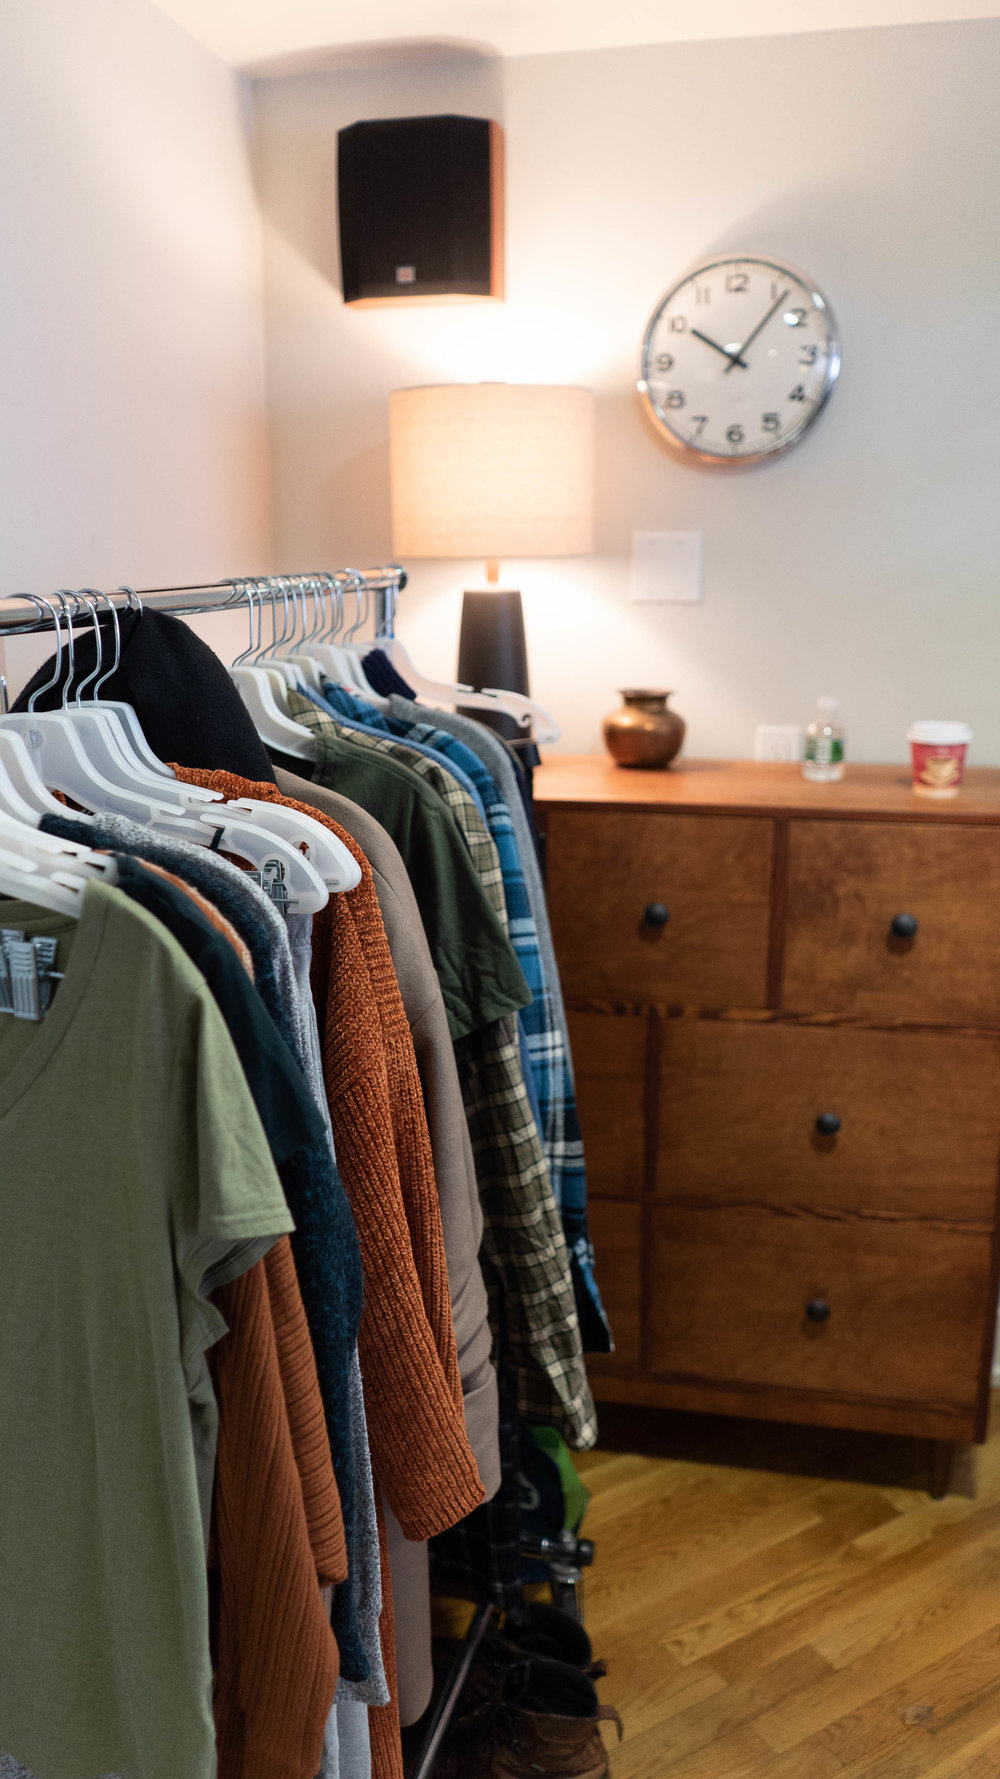 Wardrobe full of fall colors for the Dashlane shoot.